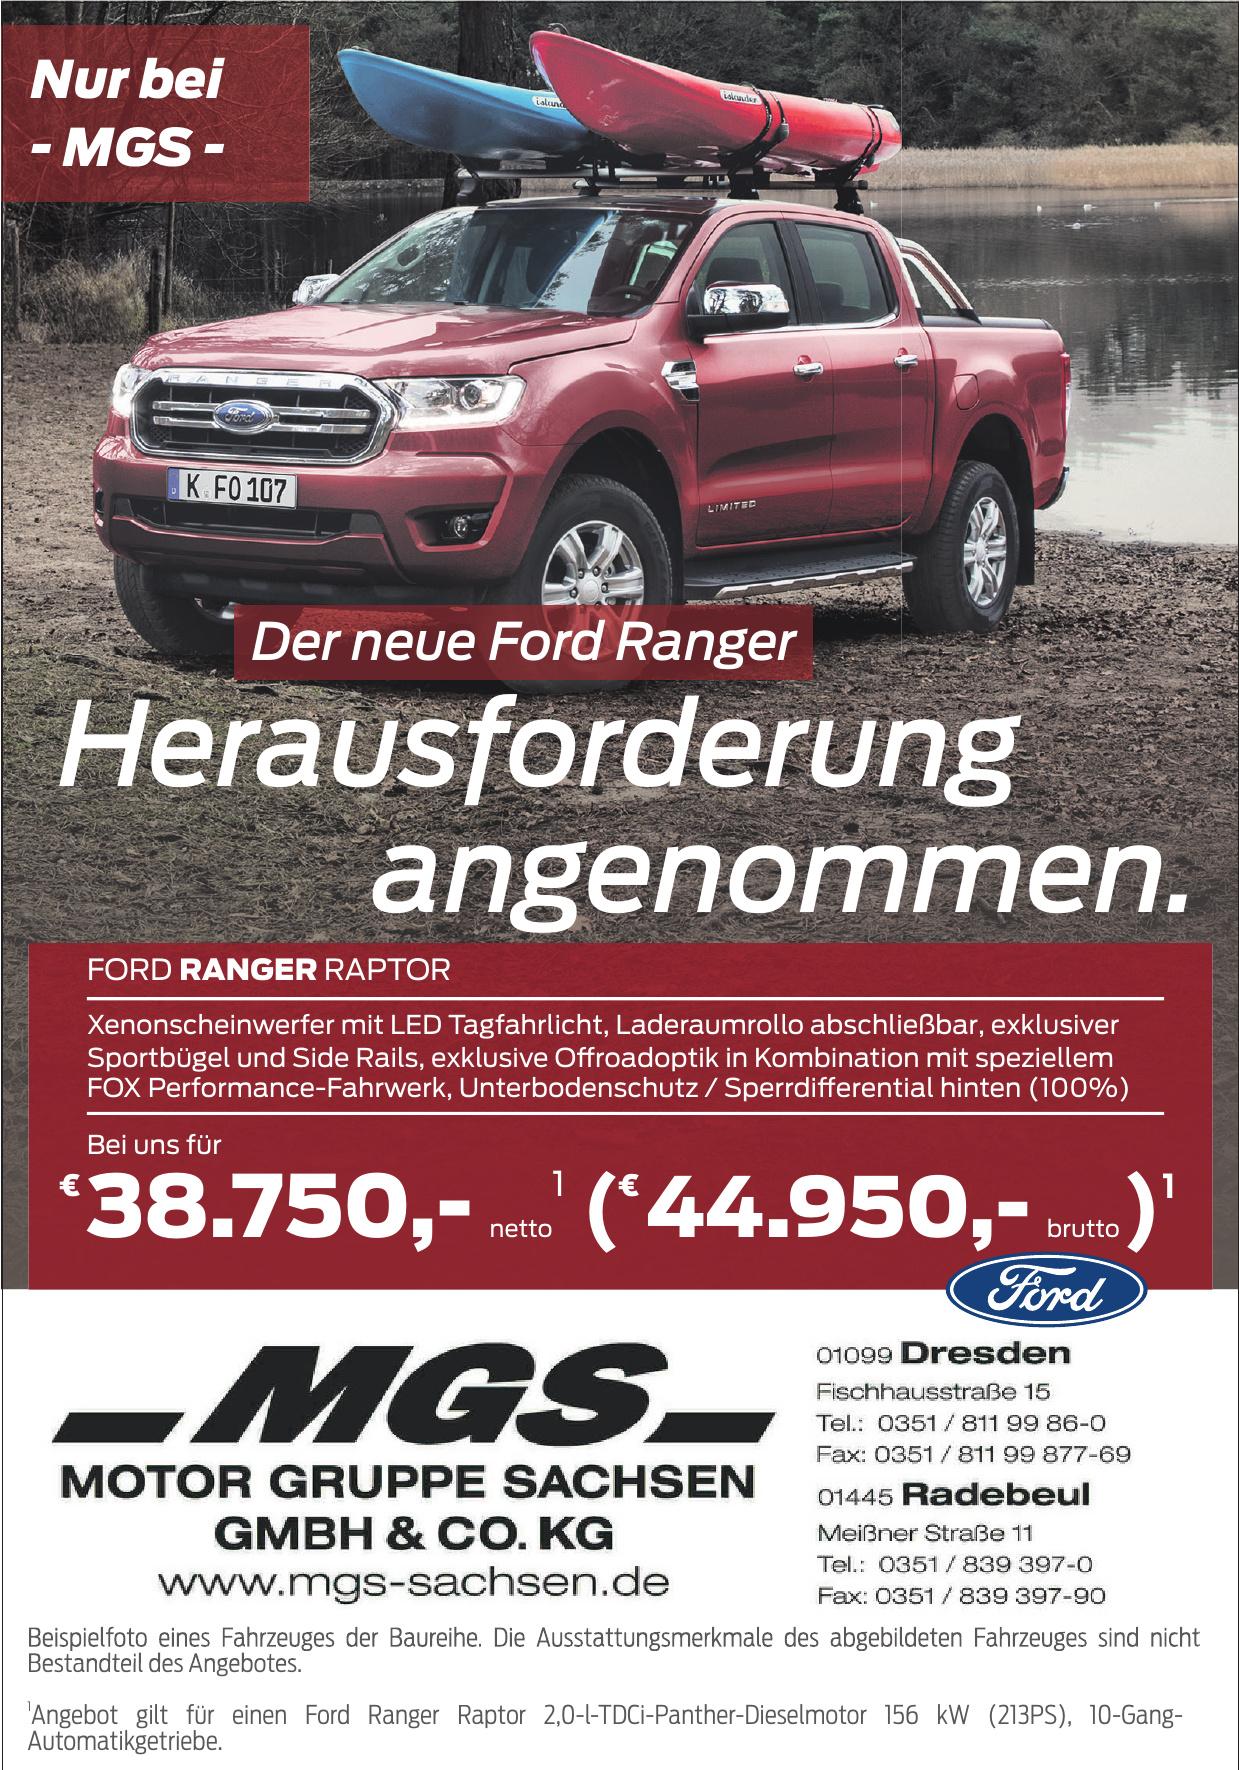 MGS Motor Gruppe Sachsen GmbH & Co. KG